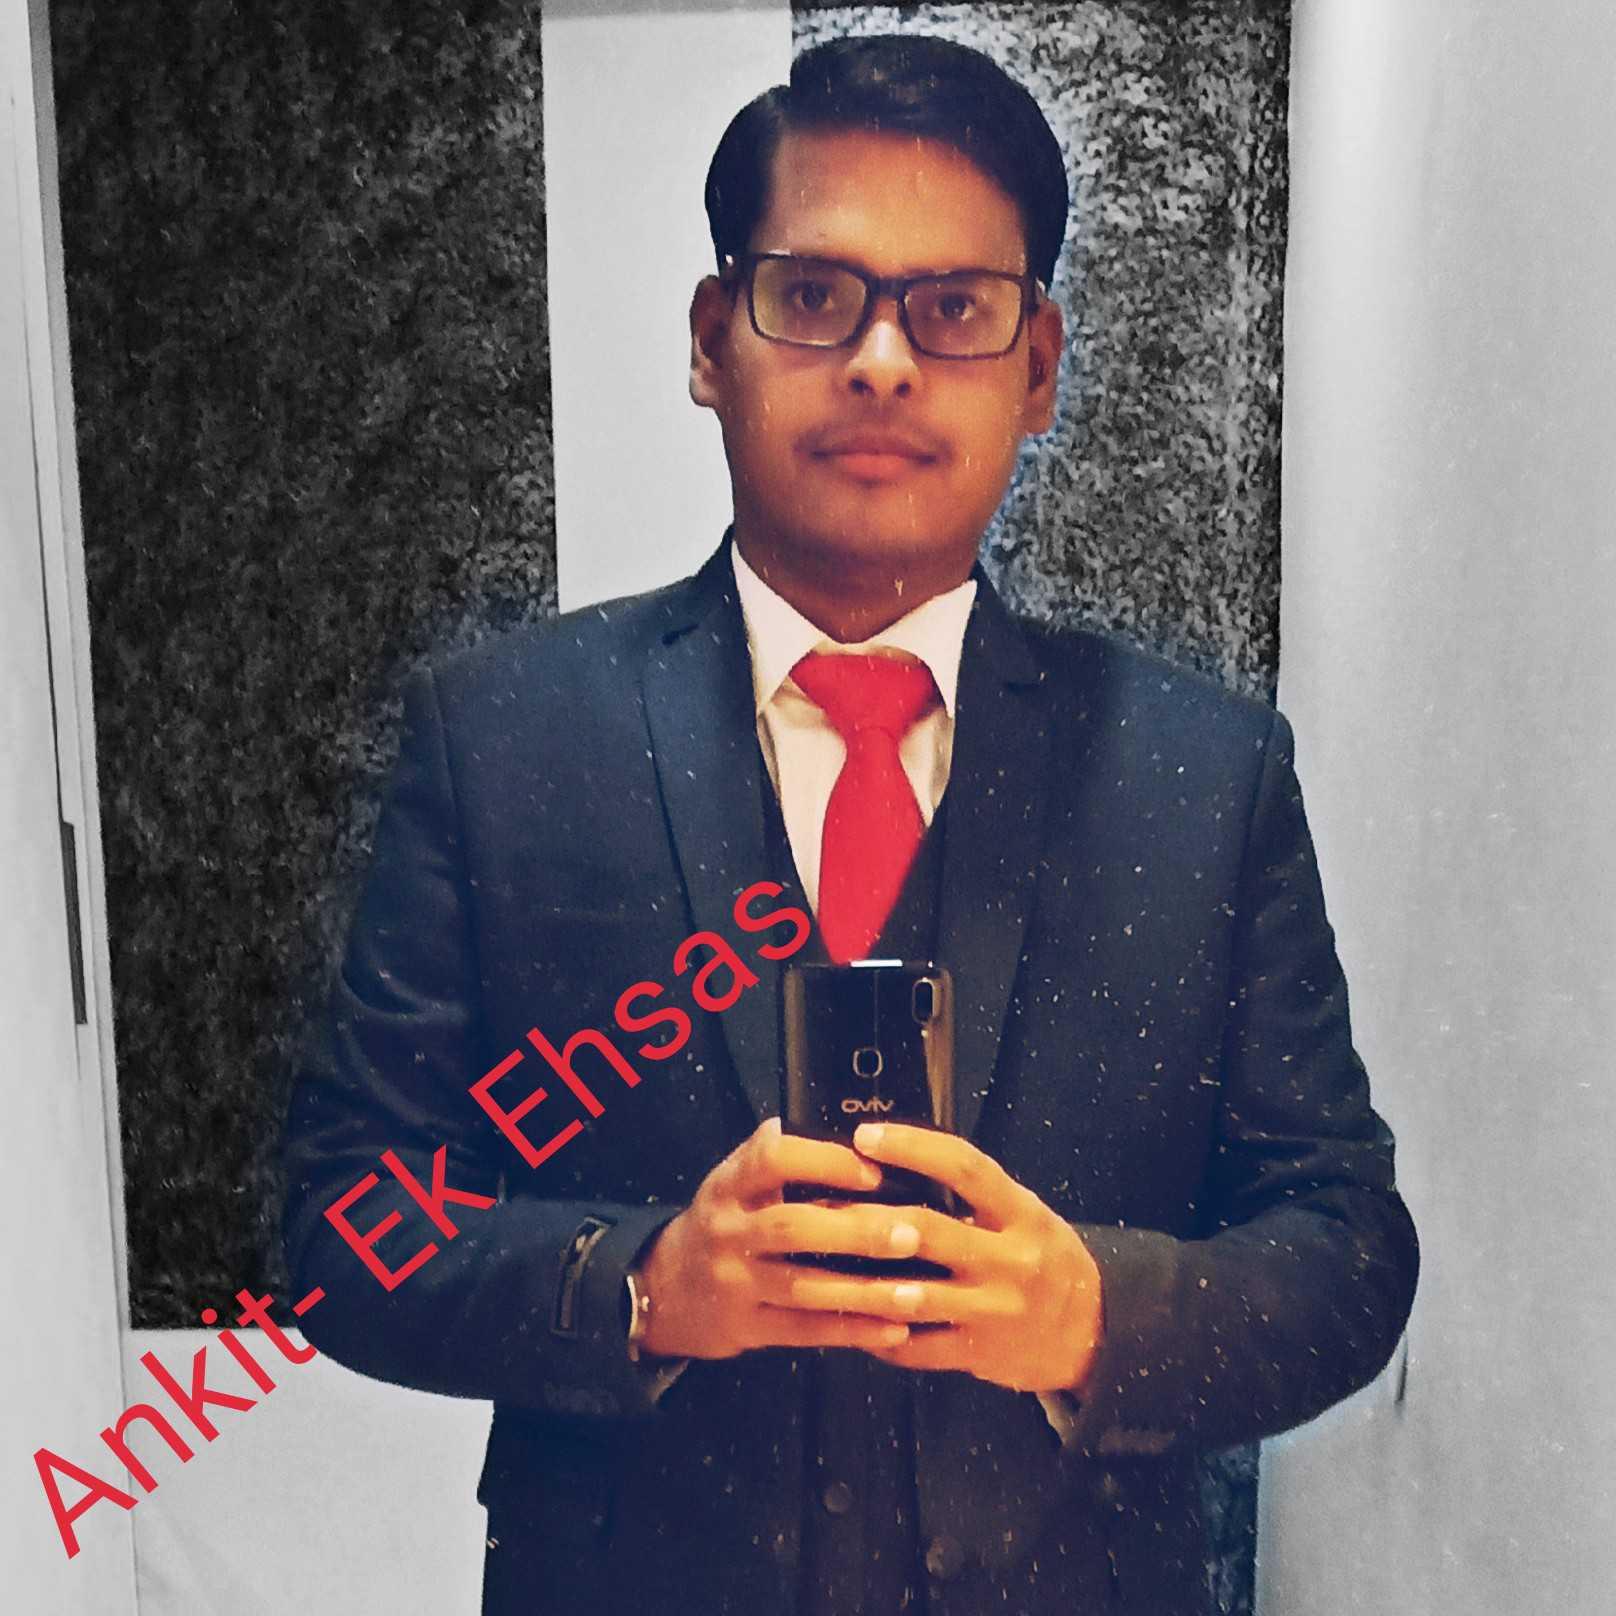 Ankit- Ek Ehsas google 👉 Ankit- Ek Ehsas😊😘 Insta: @ankit_ek_ehsas fb: Ankit- Ek Ehsas Youtube: Ankit- Ek Ehsas